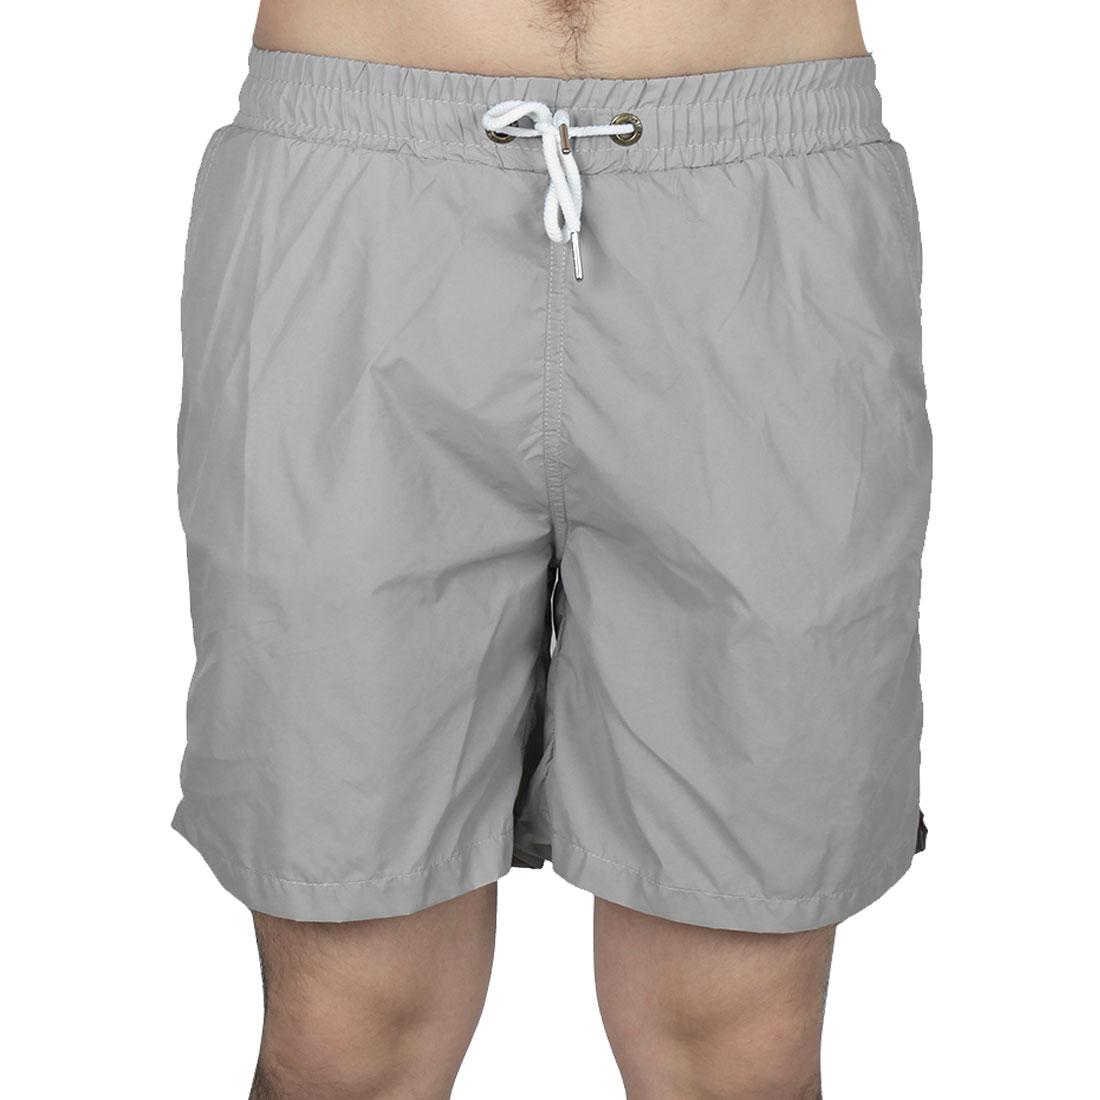 Men Exercise Running Polyester Summer Beach Surf Board Shorts Pants Gray W32